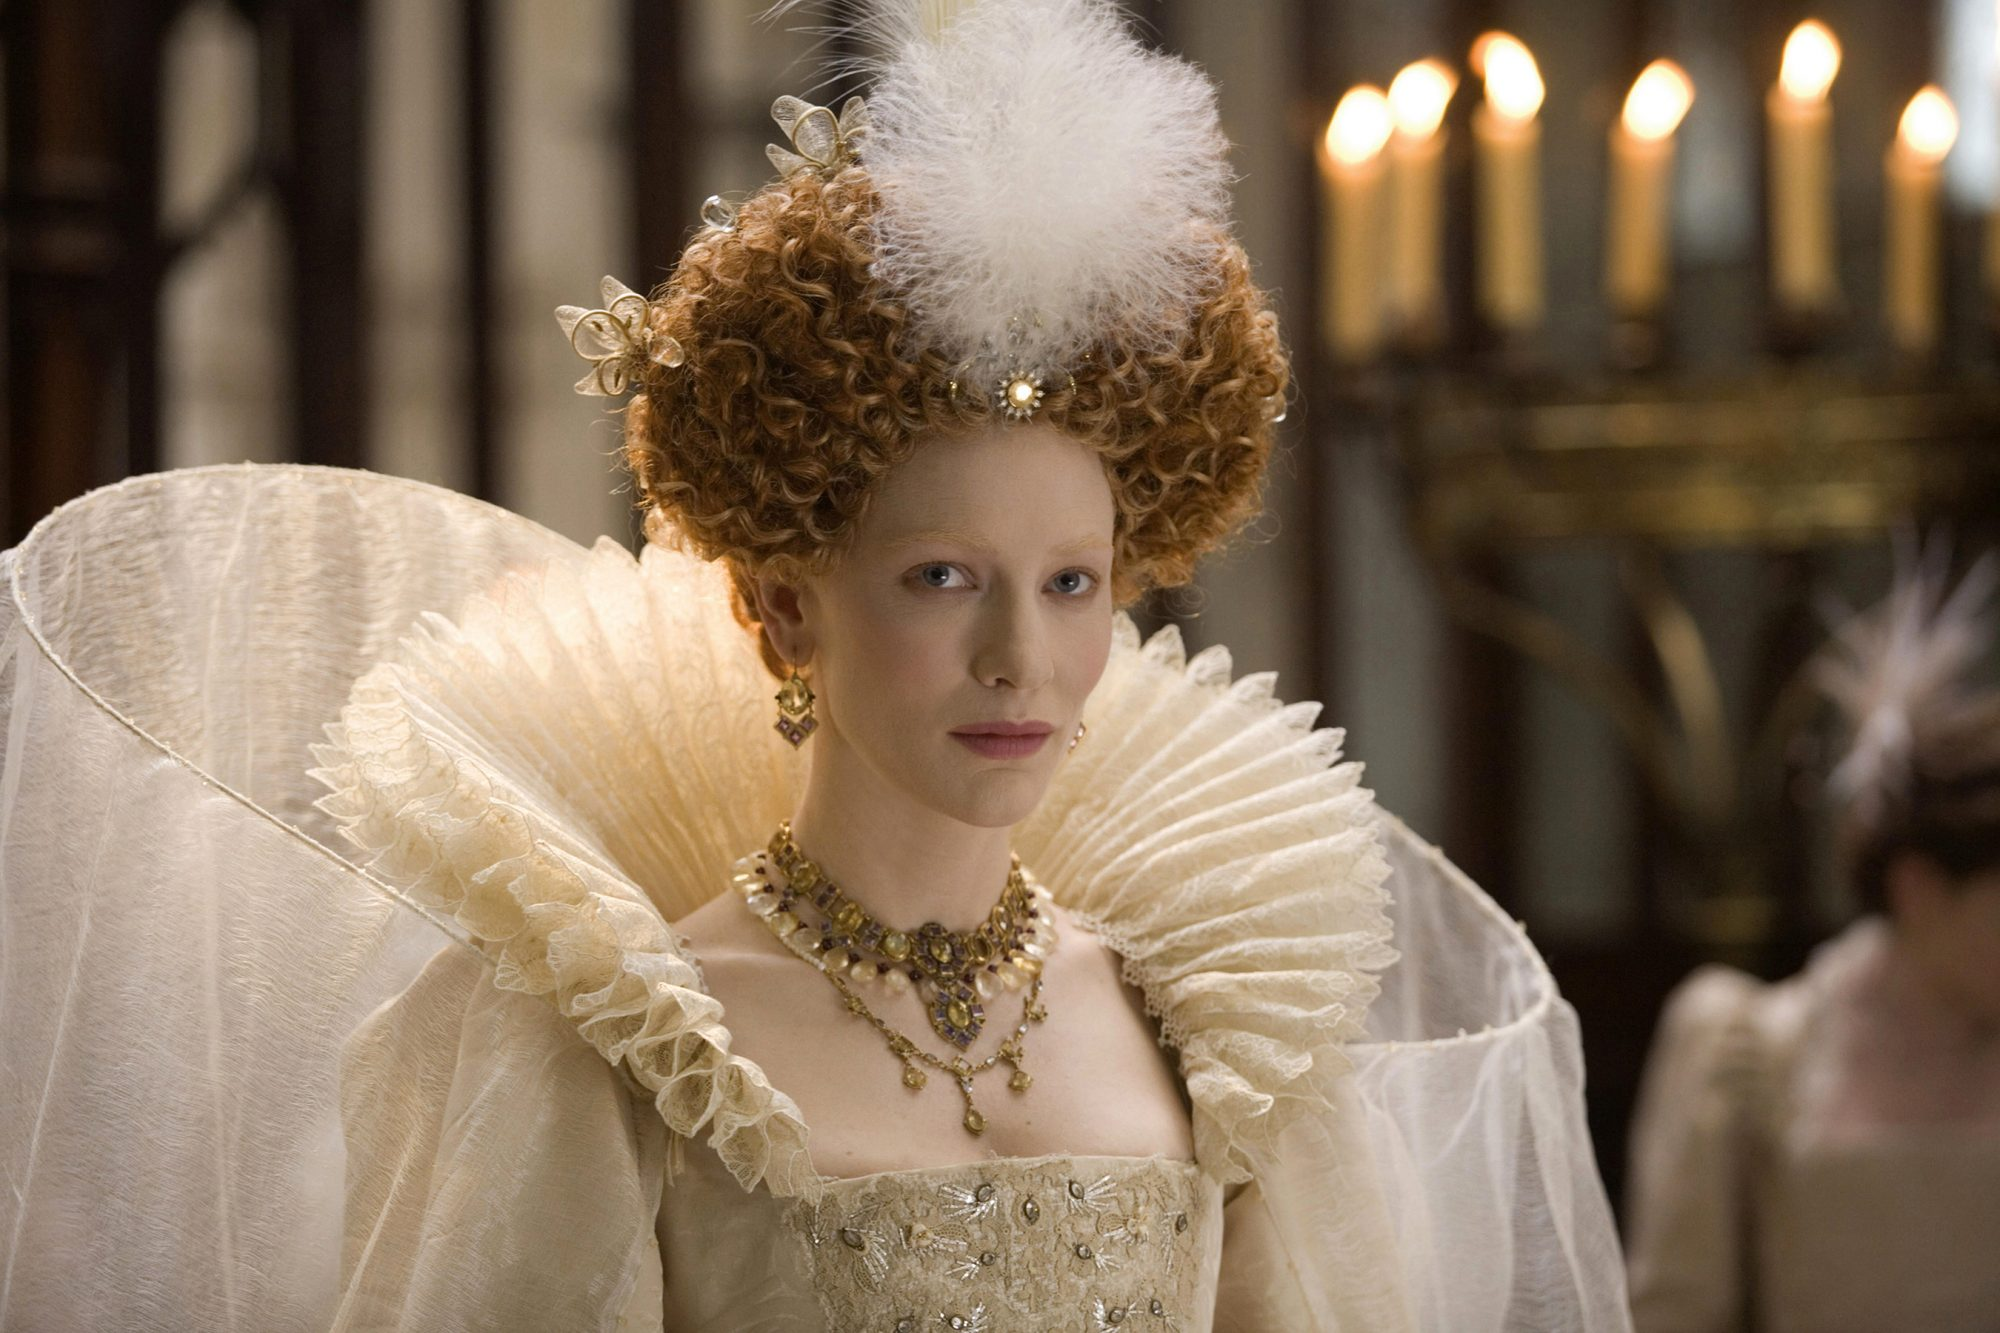 Film Title: Elizabeth: The Golden Age